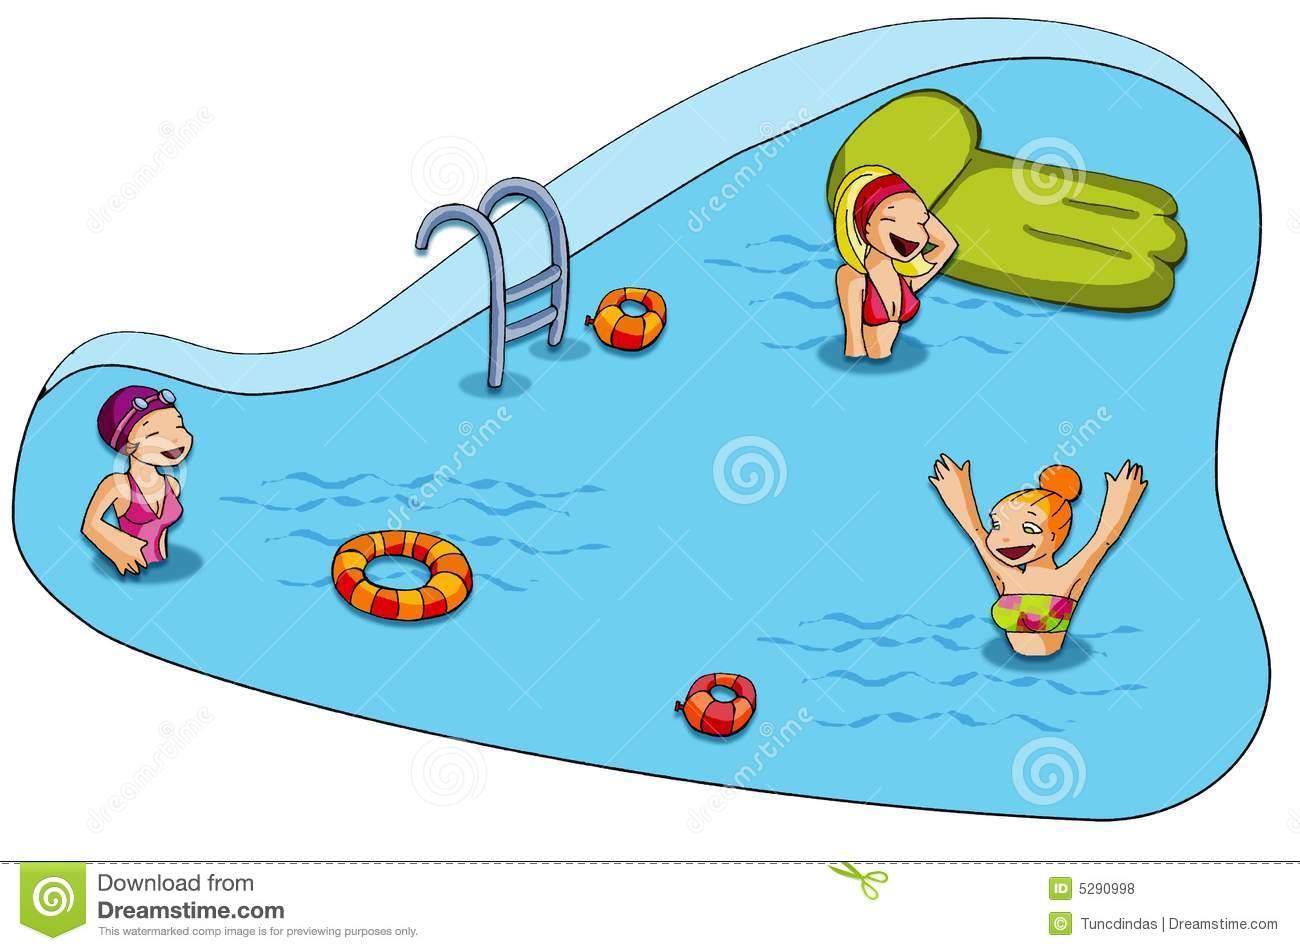 Swimming Pool Royalty Free Stock Photos -Swimming Pool Royalty Free Stock Photos Image 5290998-7